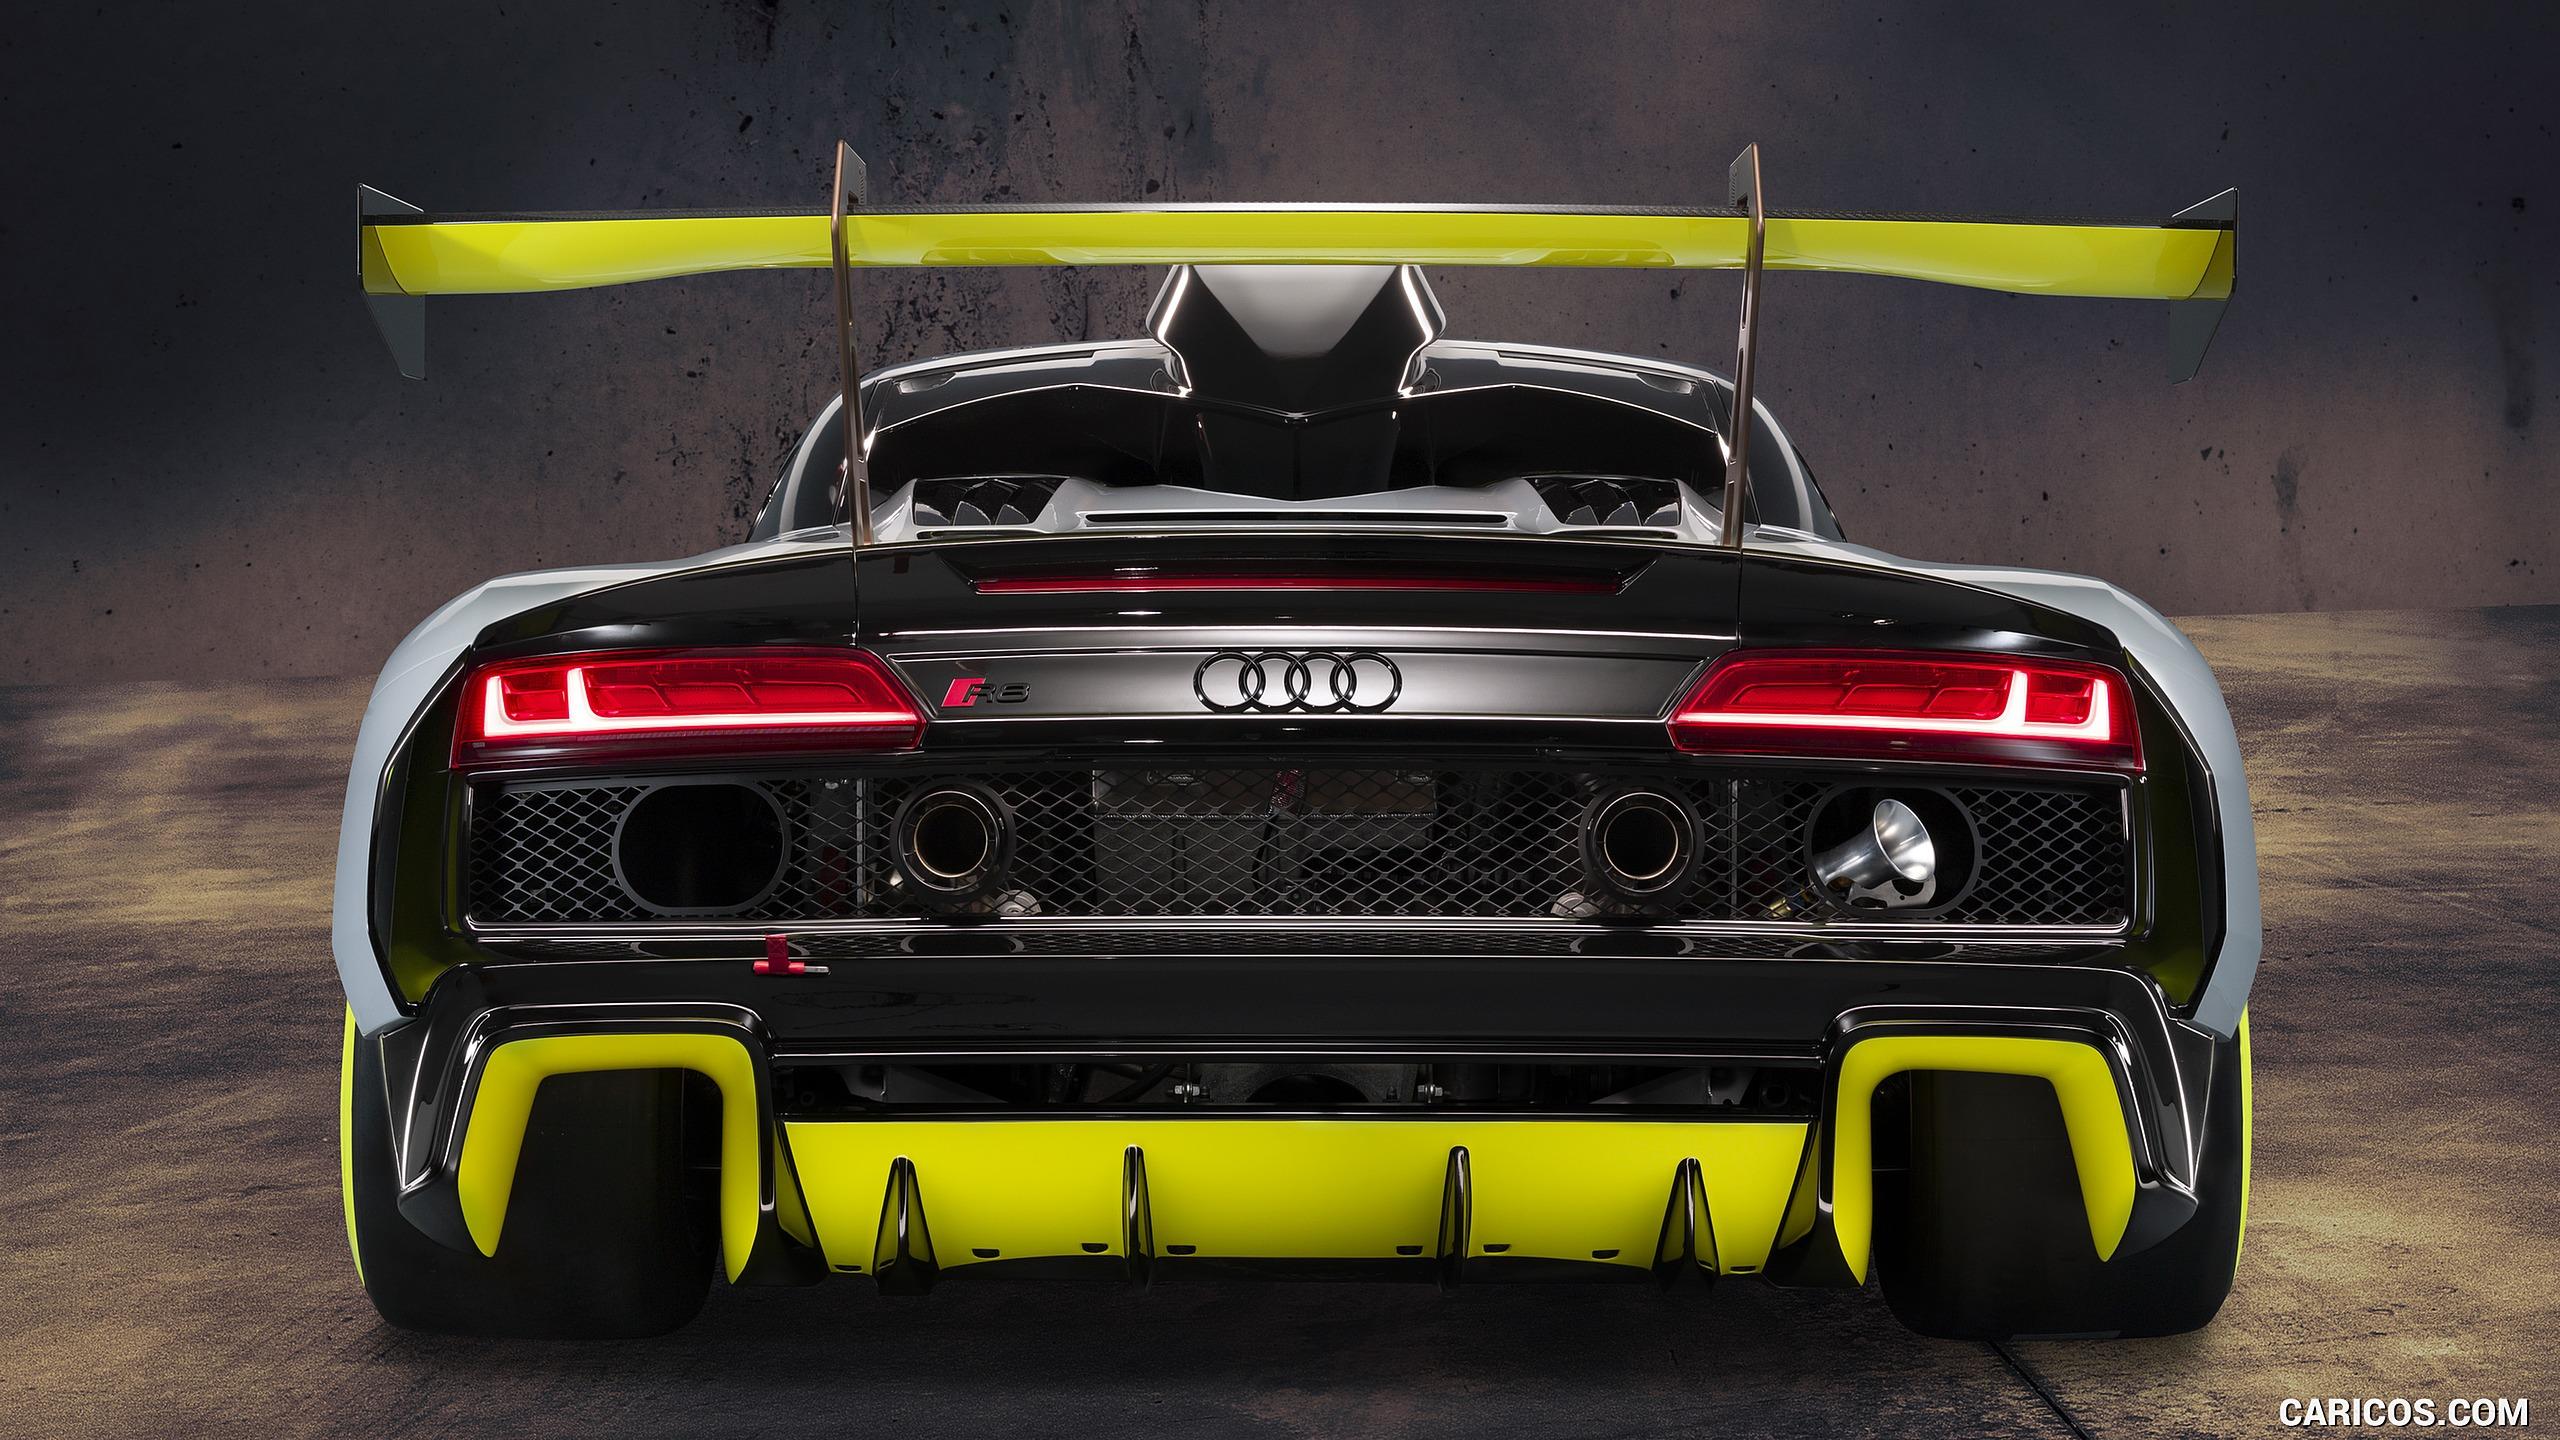 Free download 2020 Audi R8 LMS GT2 Rear HD Wallpaper 6 ...